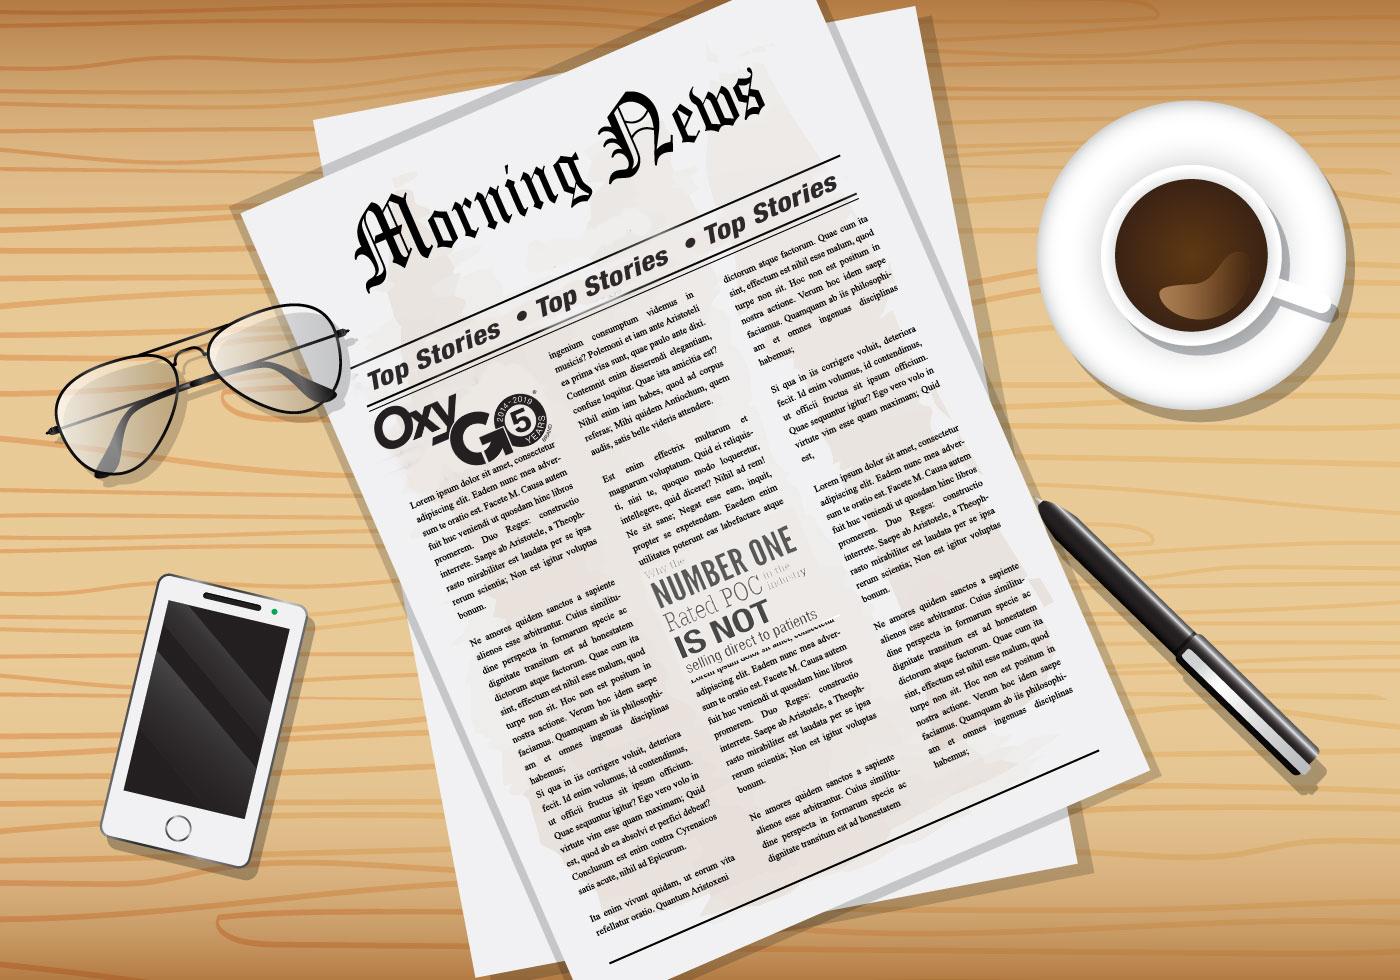 Morning News Image